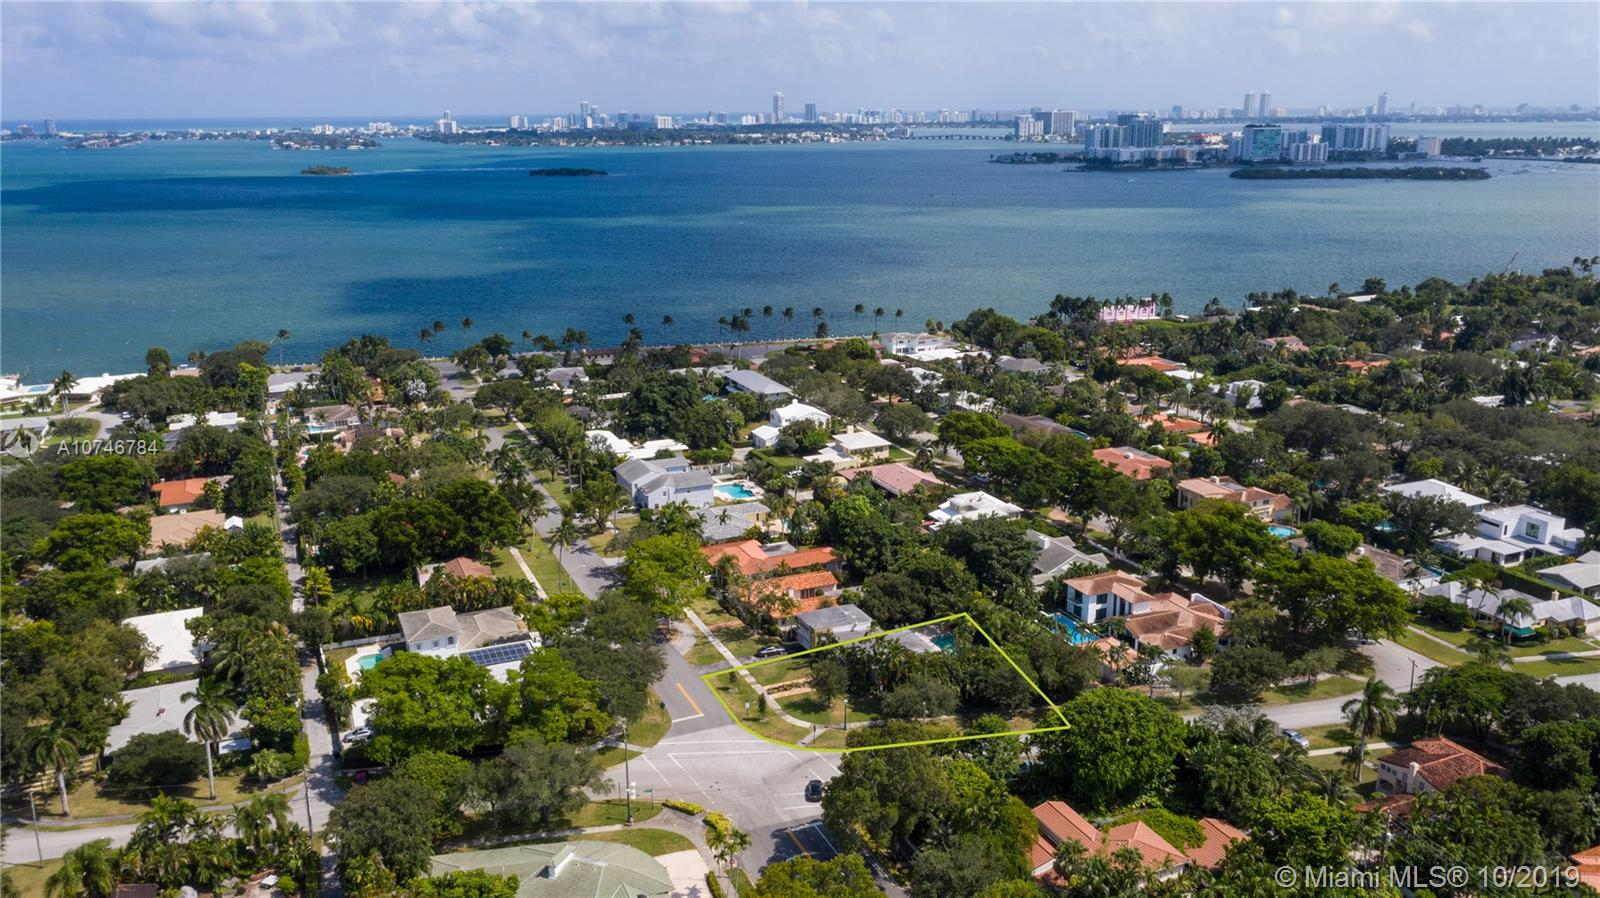 Miami Shores # - 08 - photo